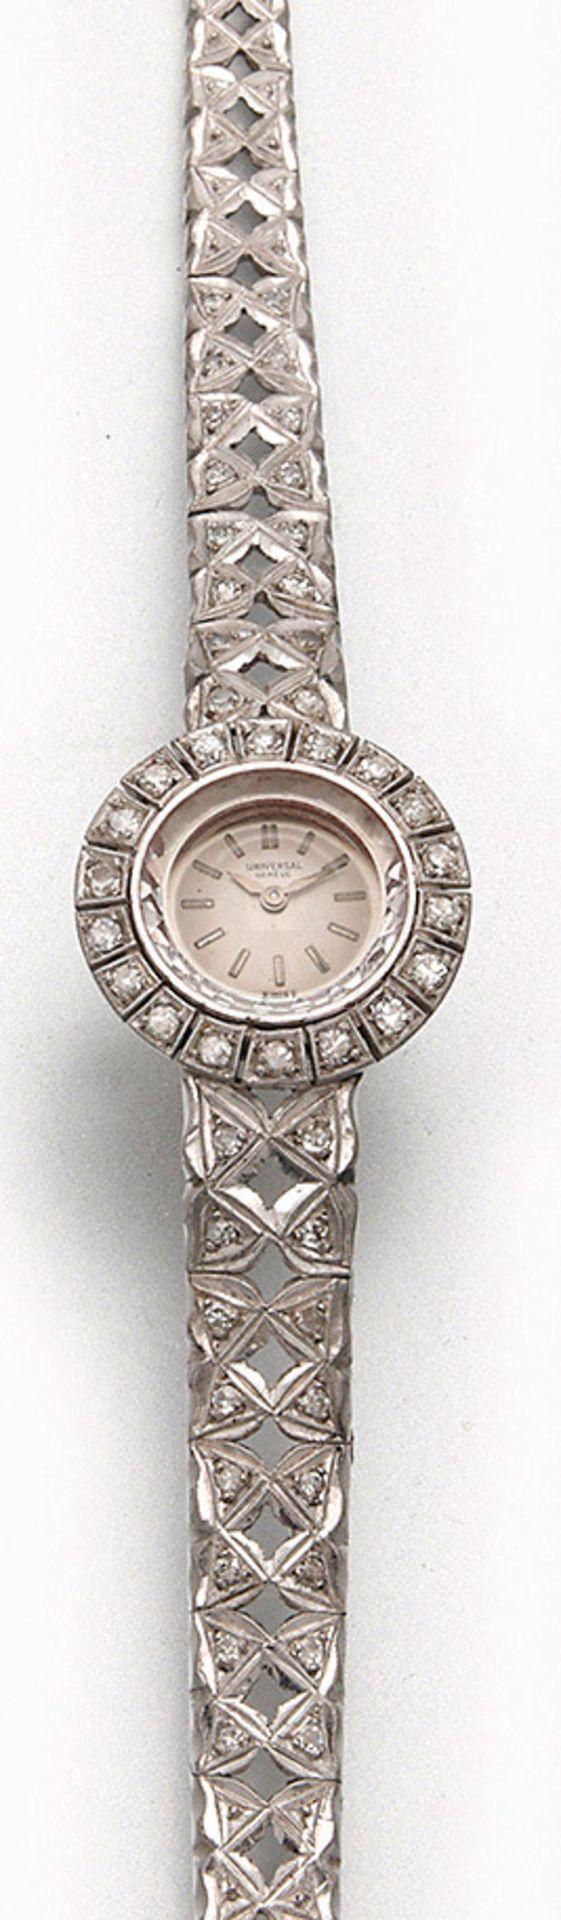 Universal Geneve-Damenarmbanduhr aus den 40er Jahren